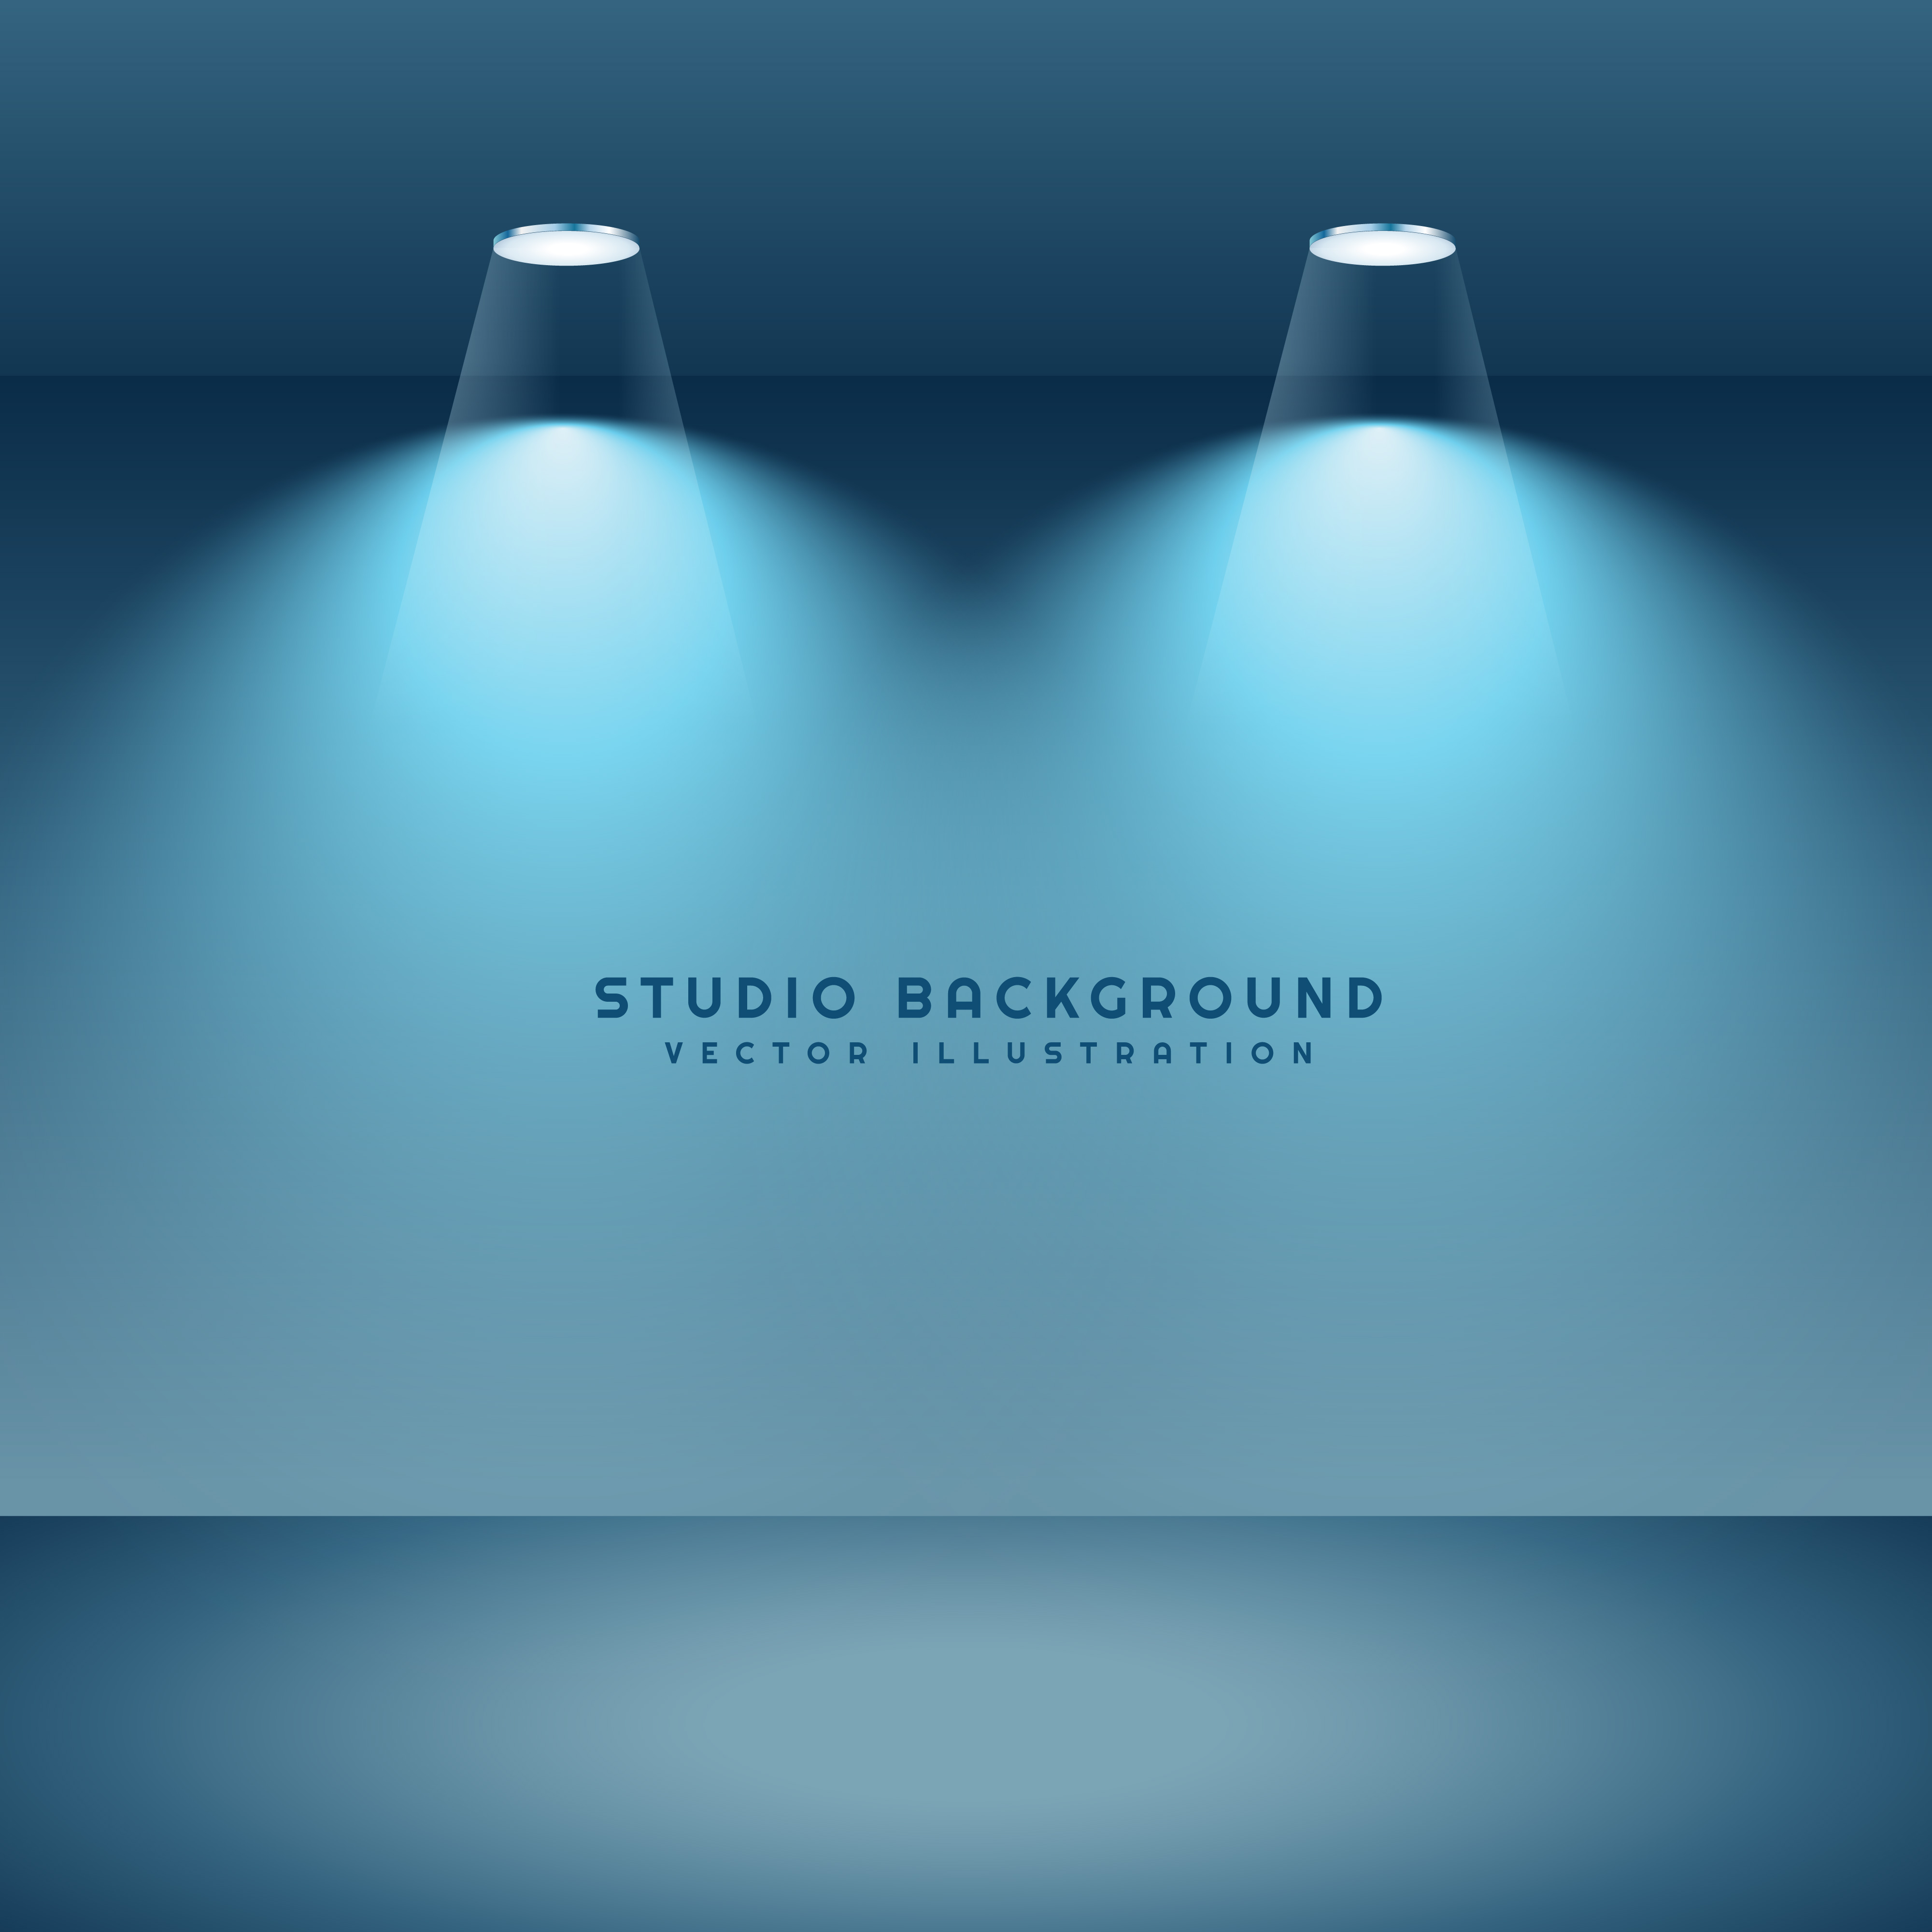 Studio Lighting Software: Studio Background With Two Spot Lights